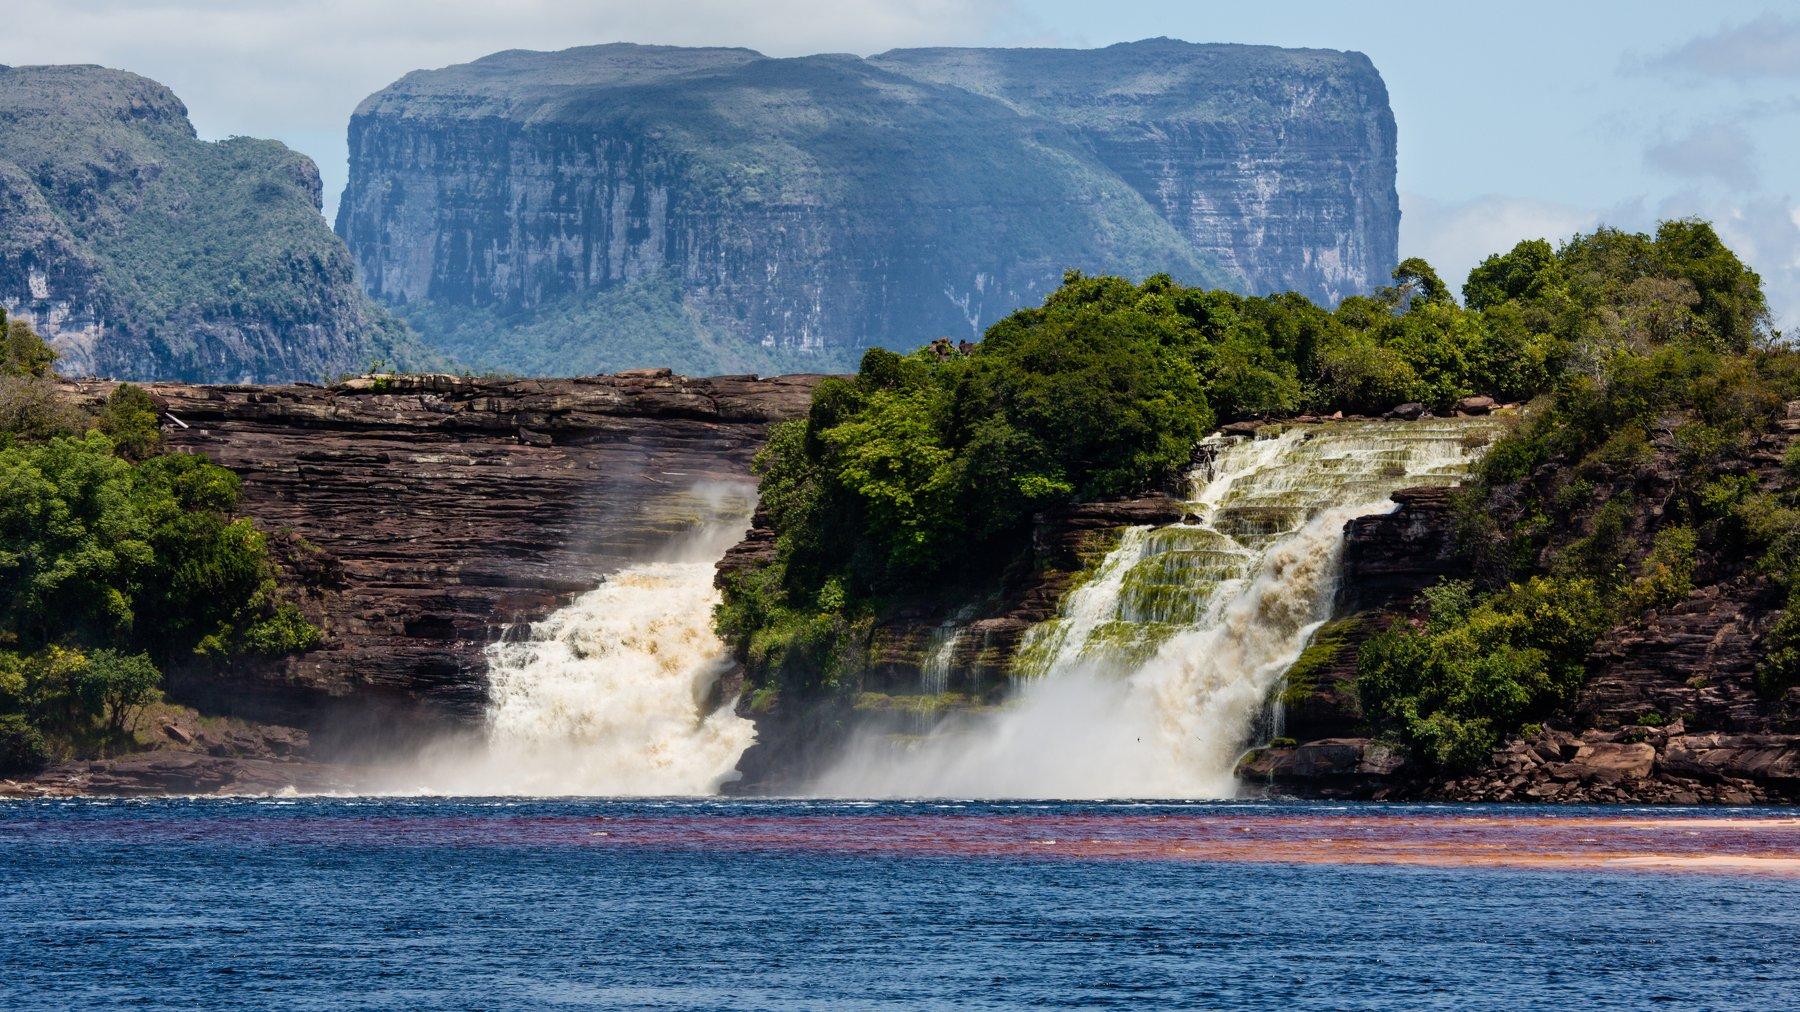 путешествия,природа,венесуэла,водопад,вода,горы,лето, Пётр Перепеченко